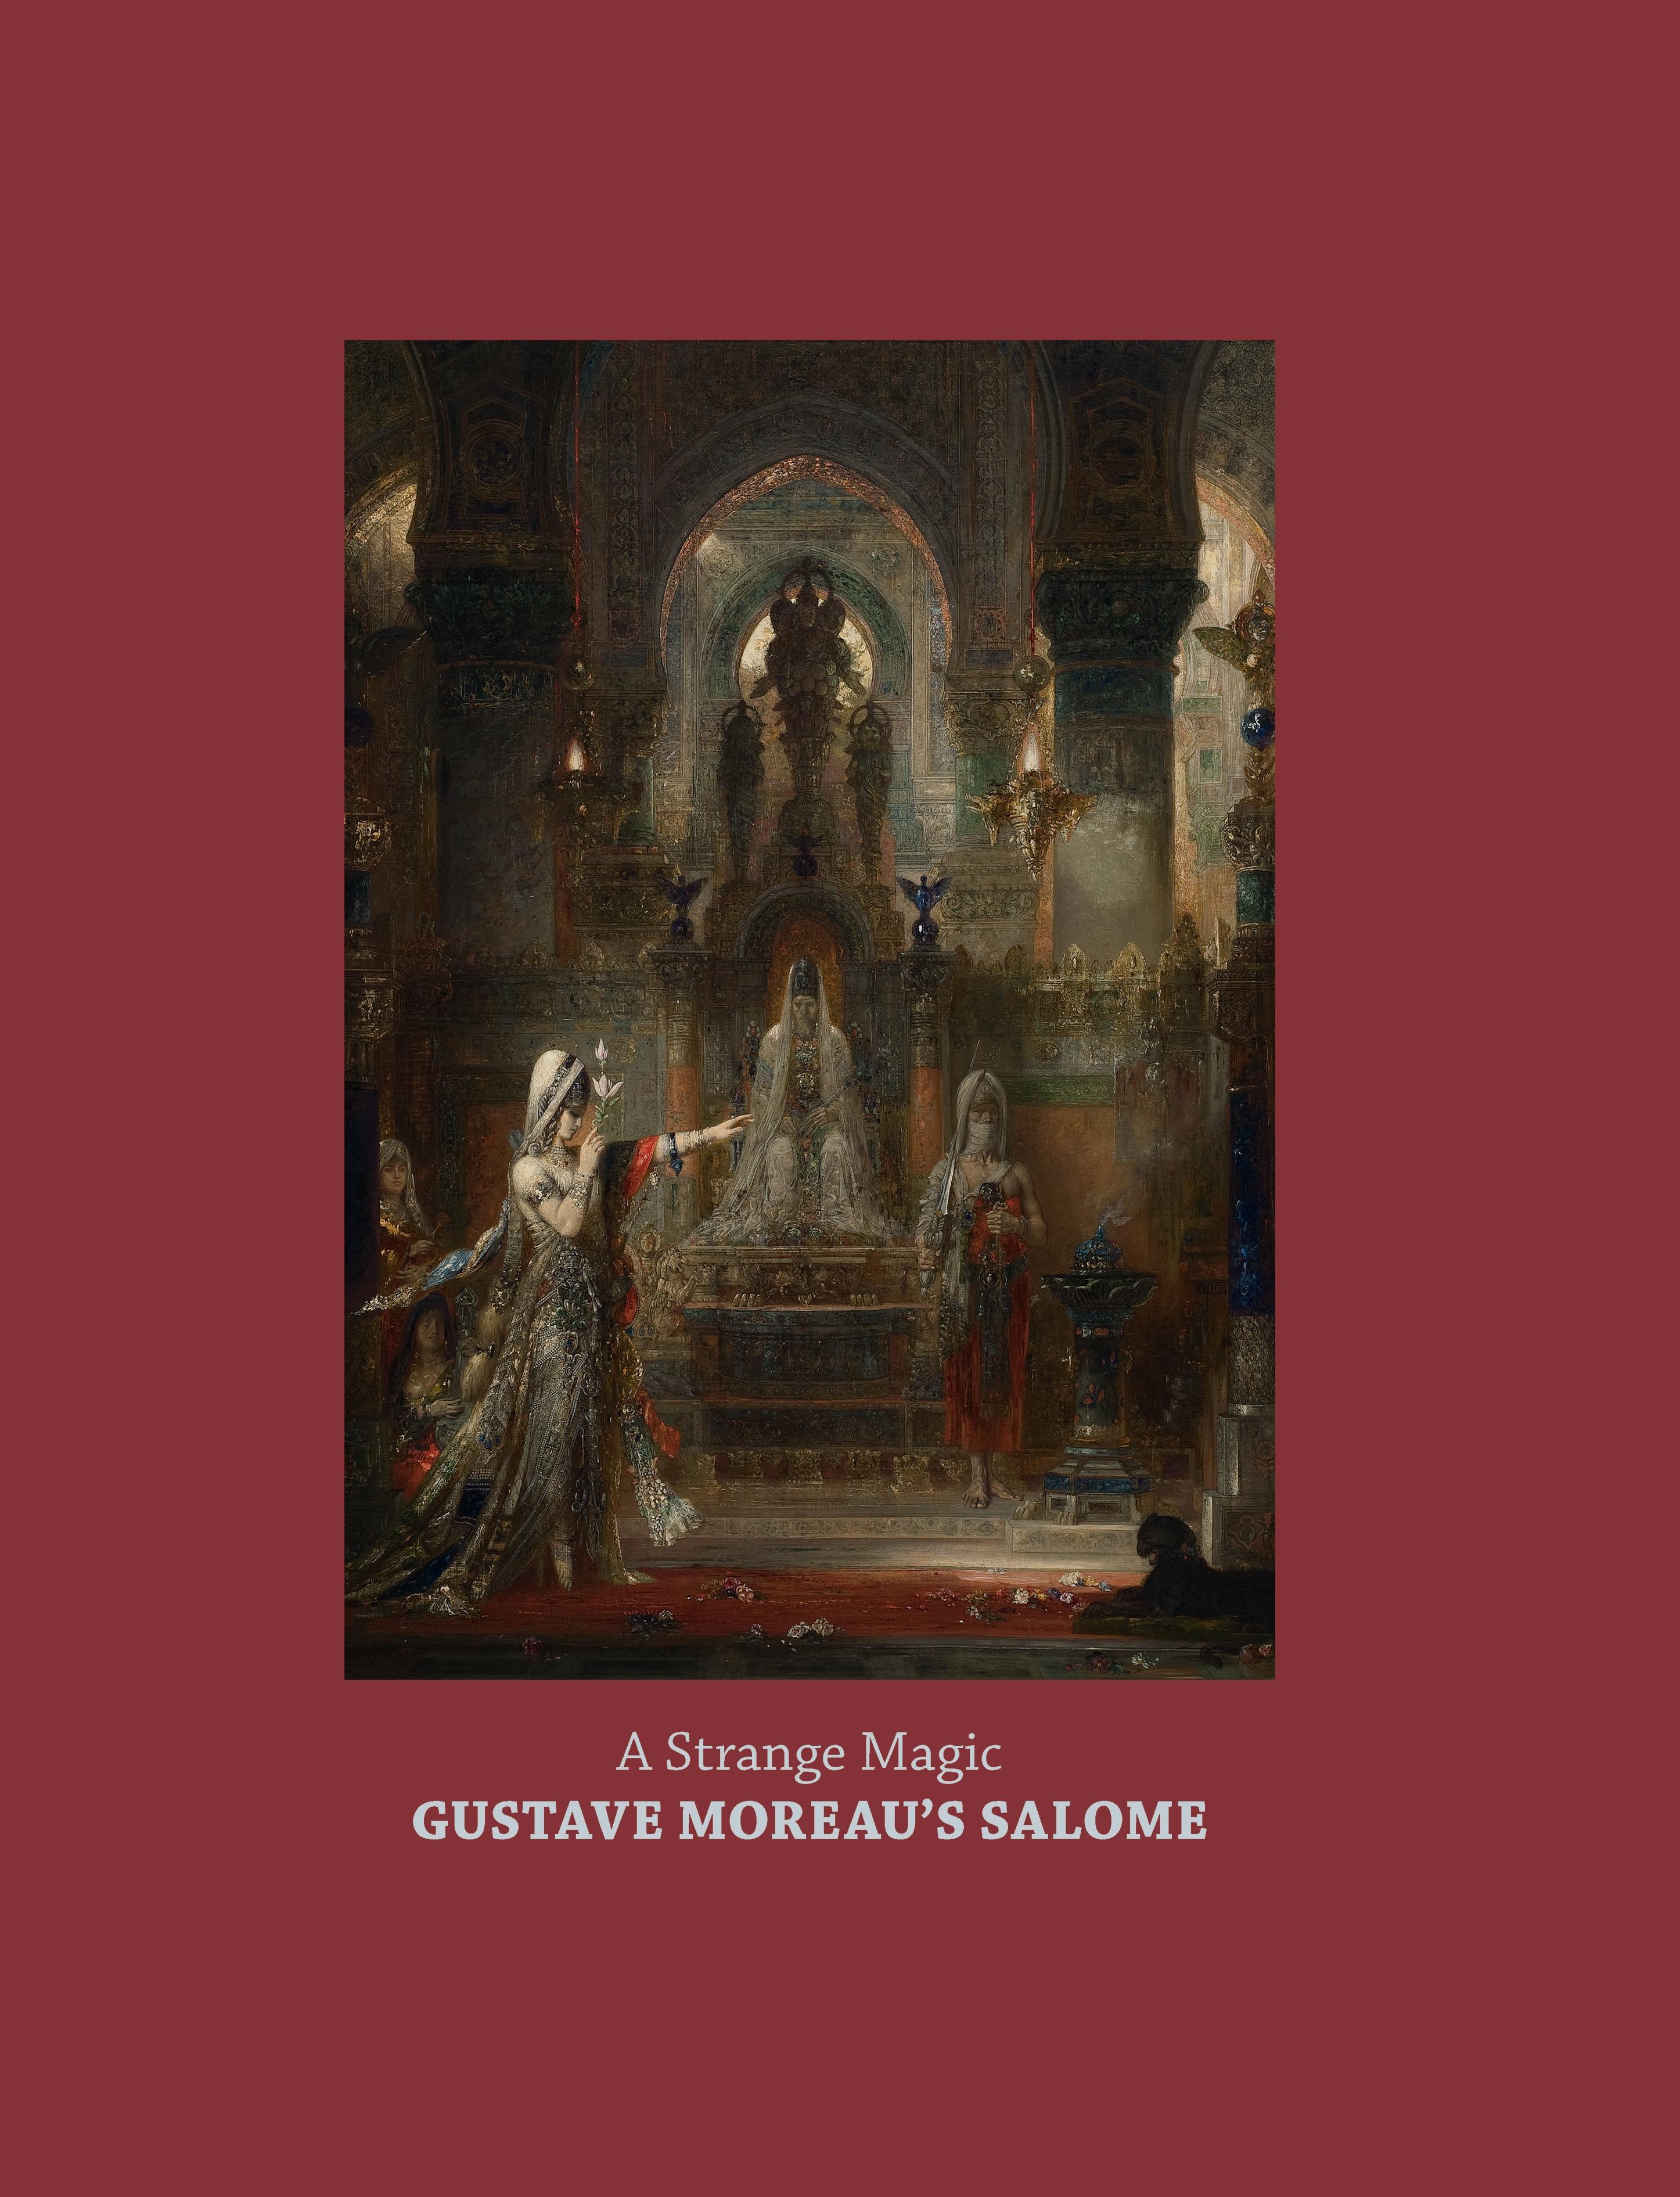 A Strange Magic Gustave Moreaus Salome